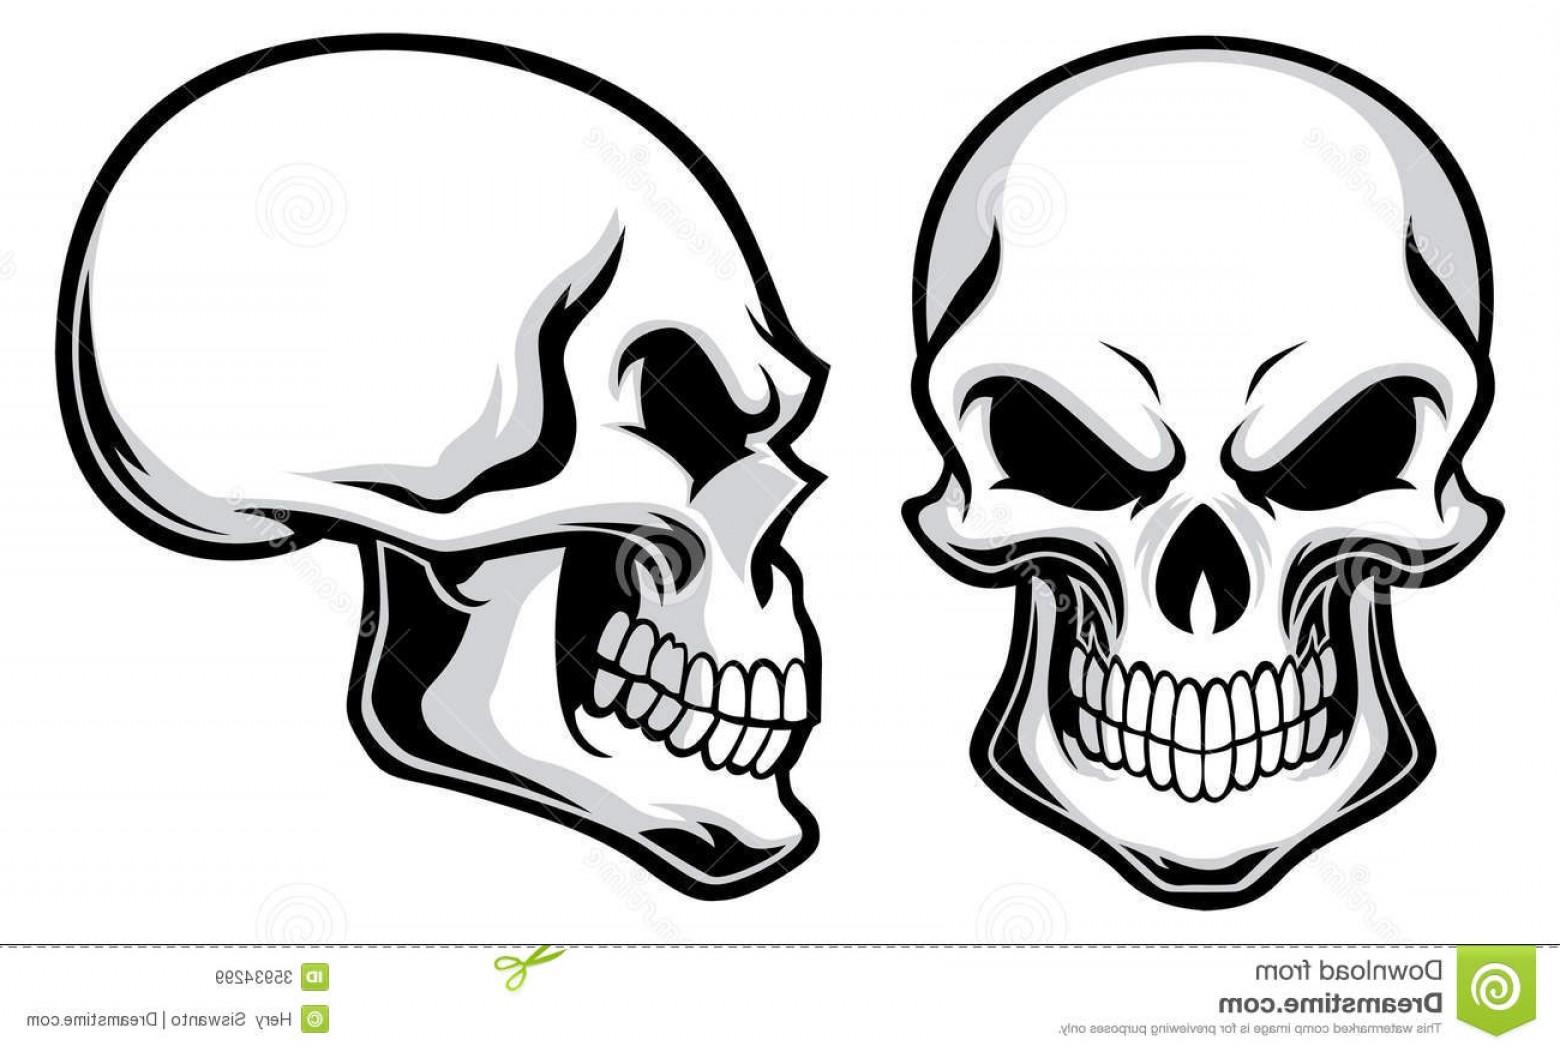 Royalty Free Stock Images Cartoon Skulls Vector Separated Easy To Edit Image Soidergi Adesivos